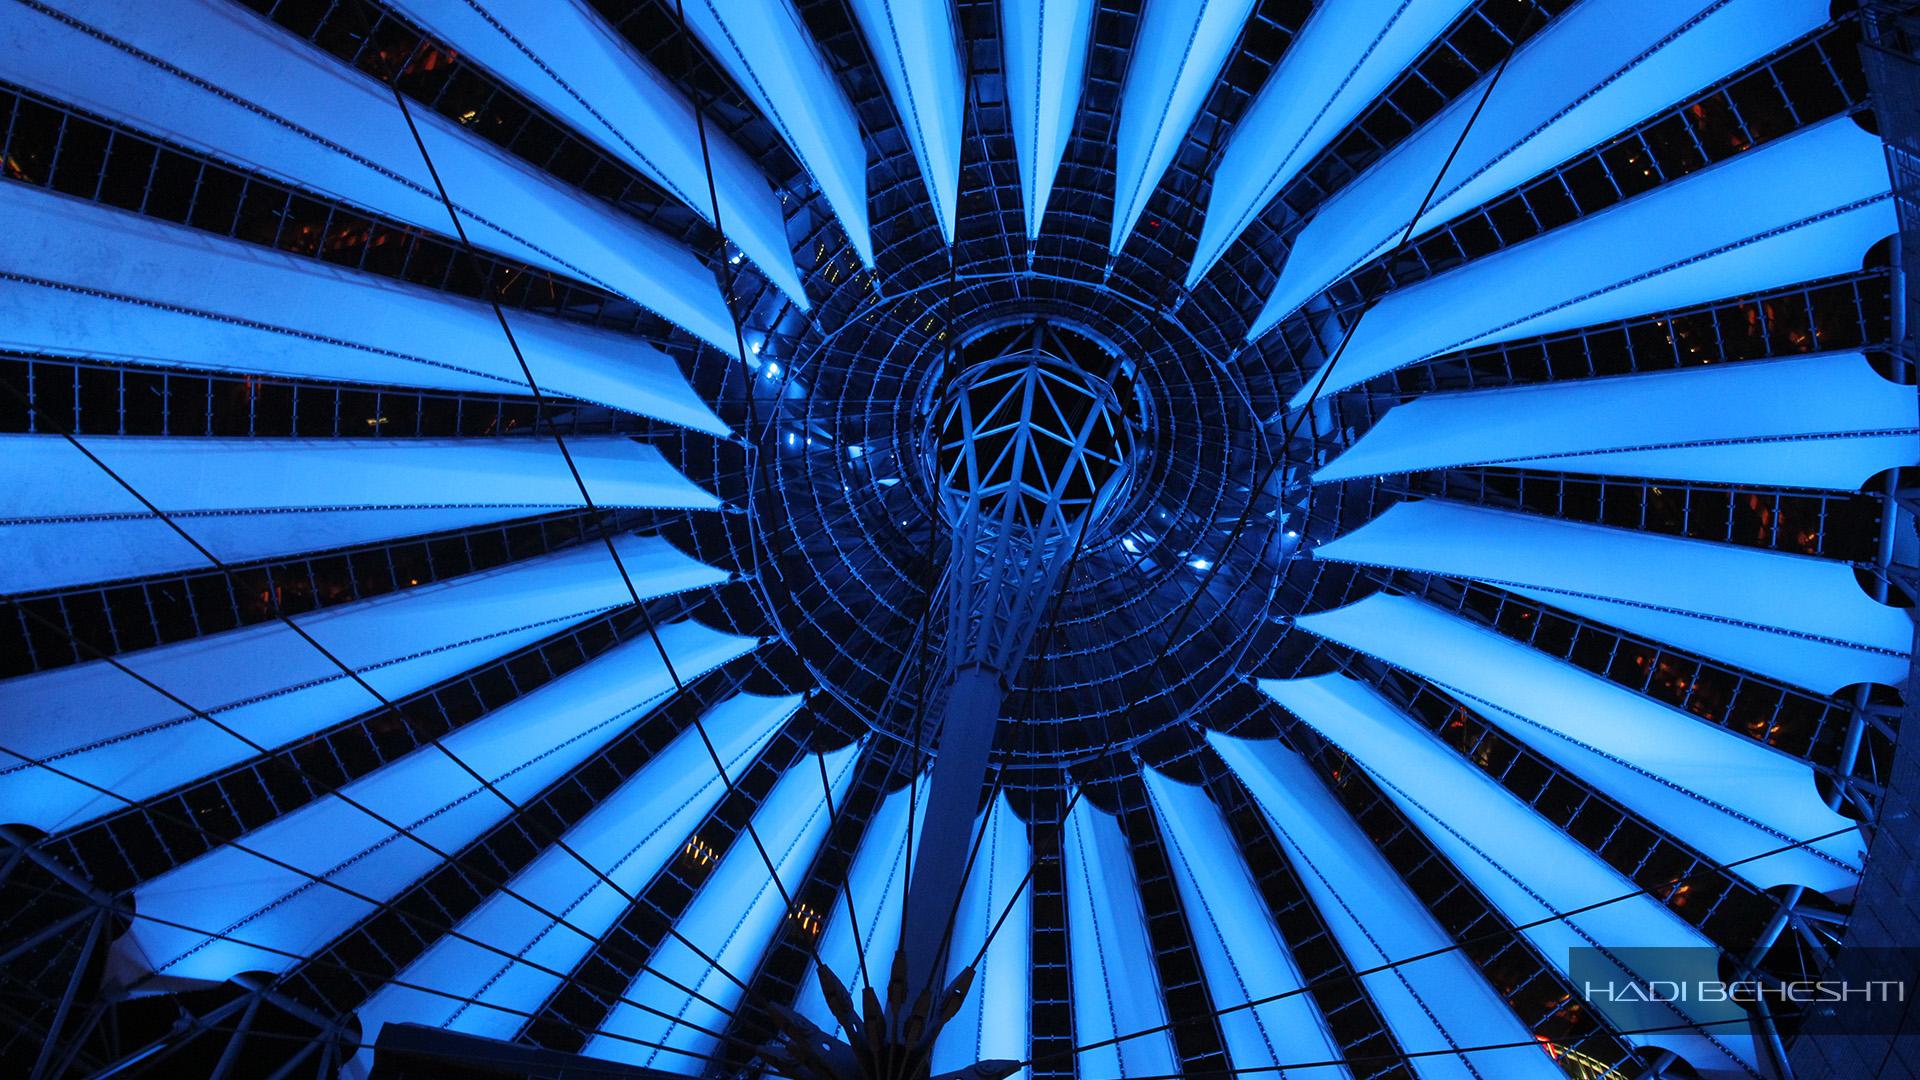 Sony Center Berlin Photo-by-Hadi-Beheshti